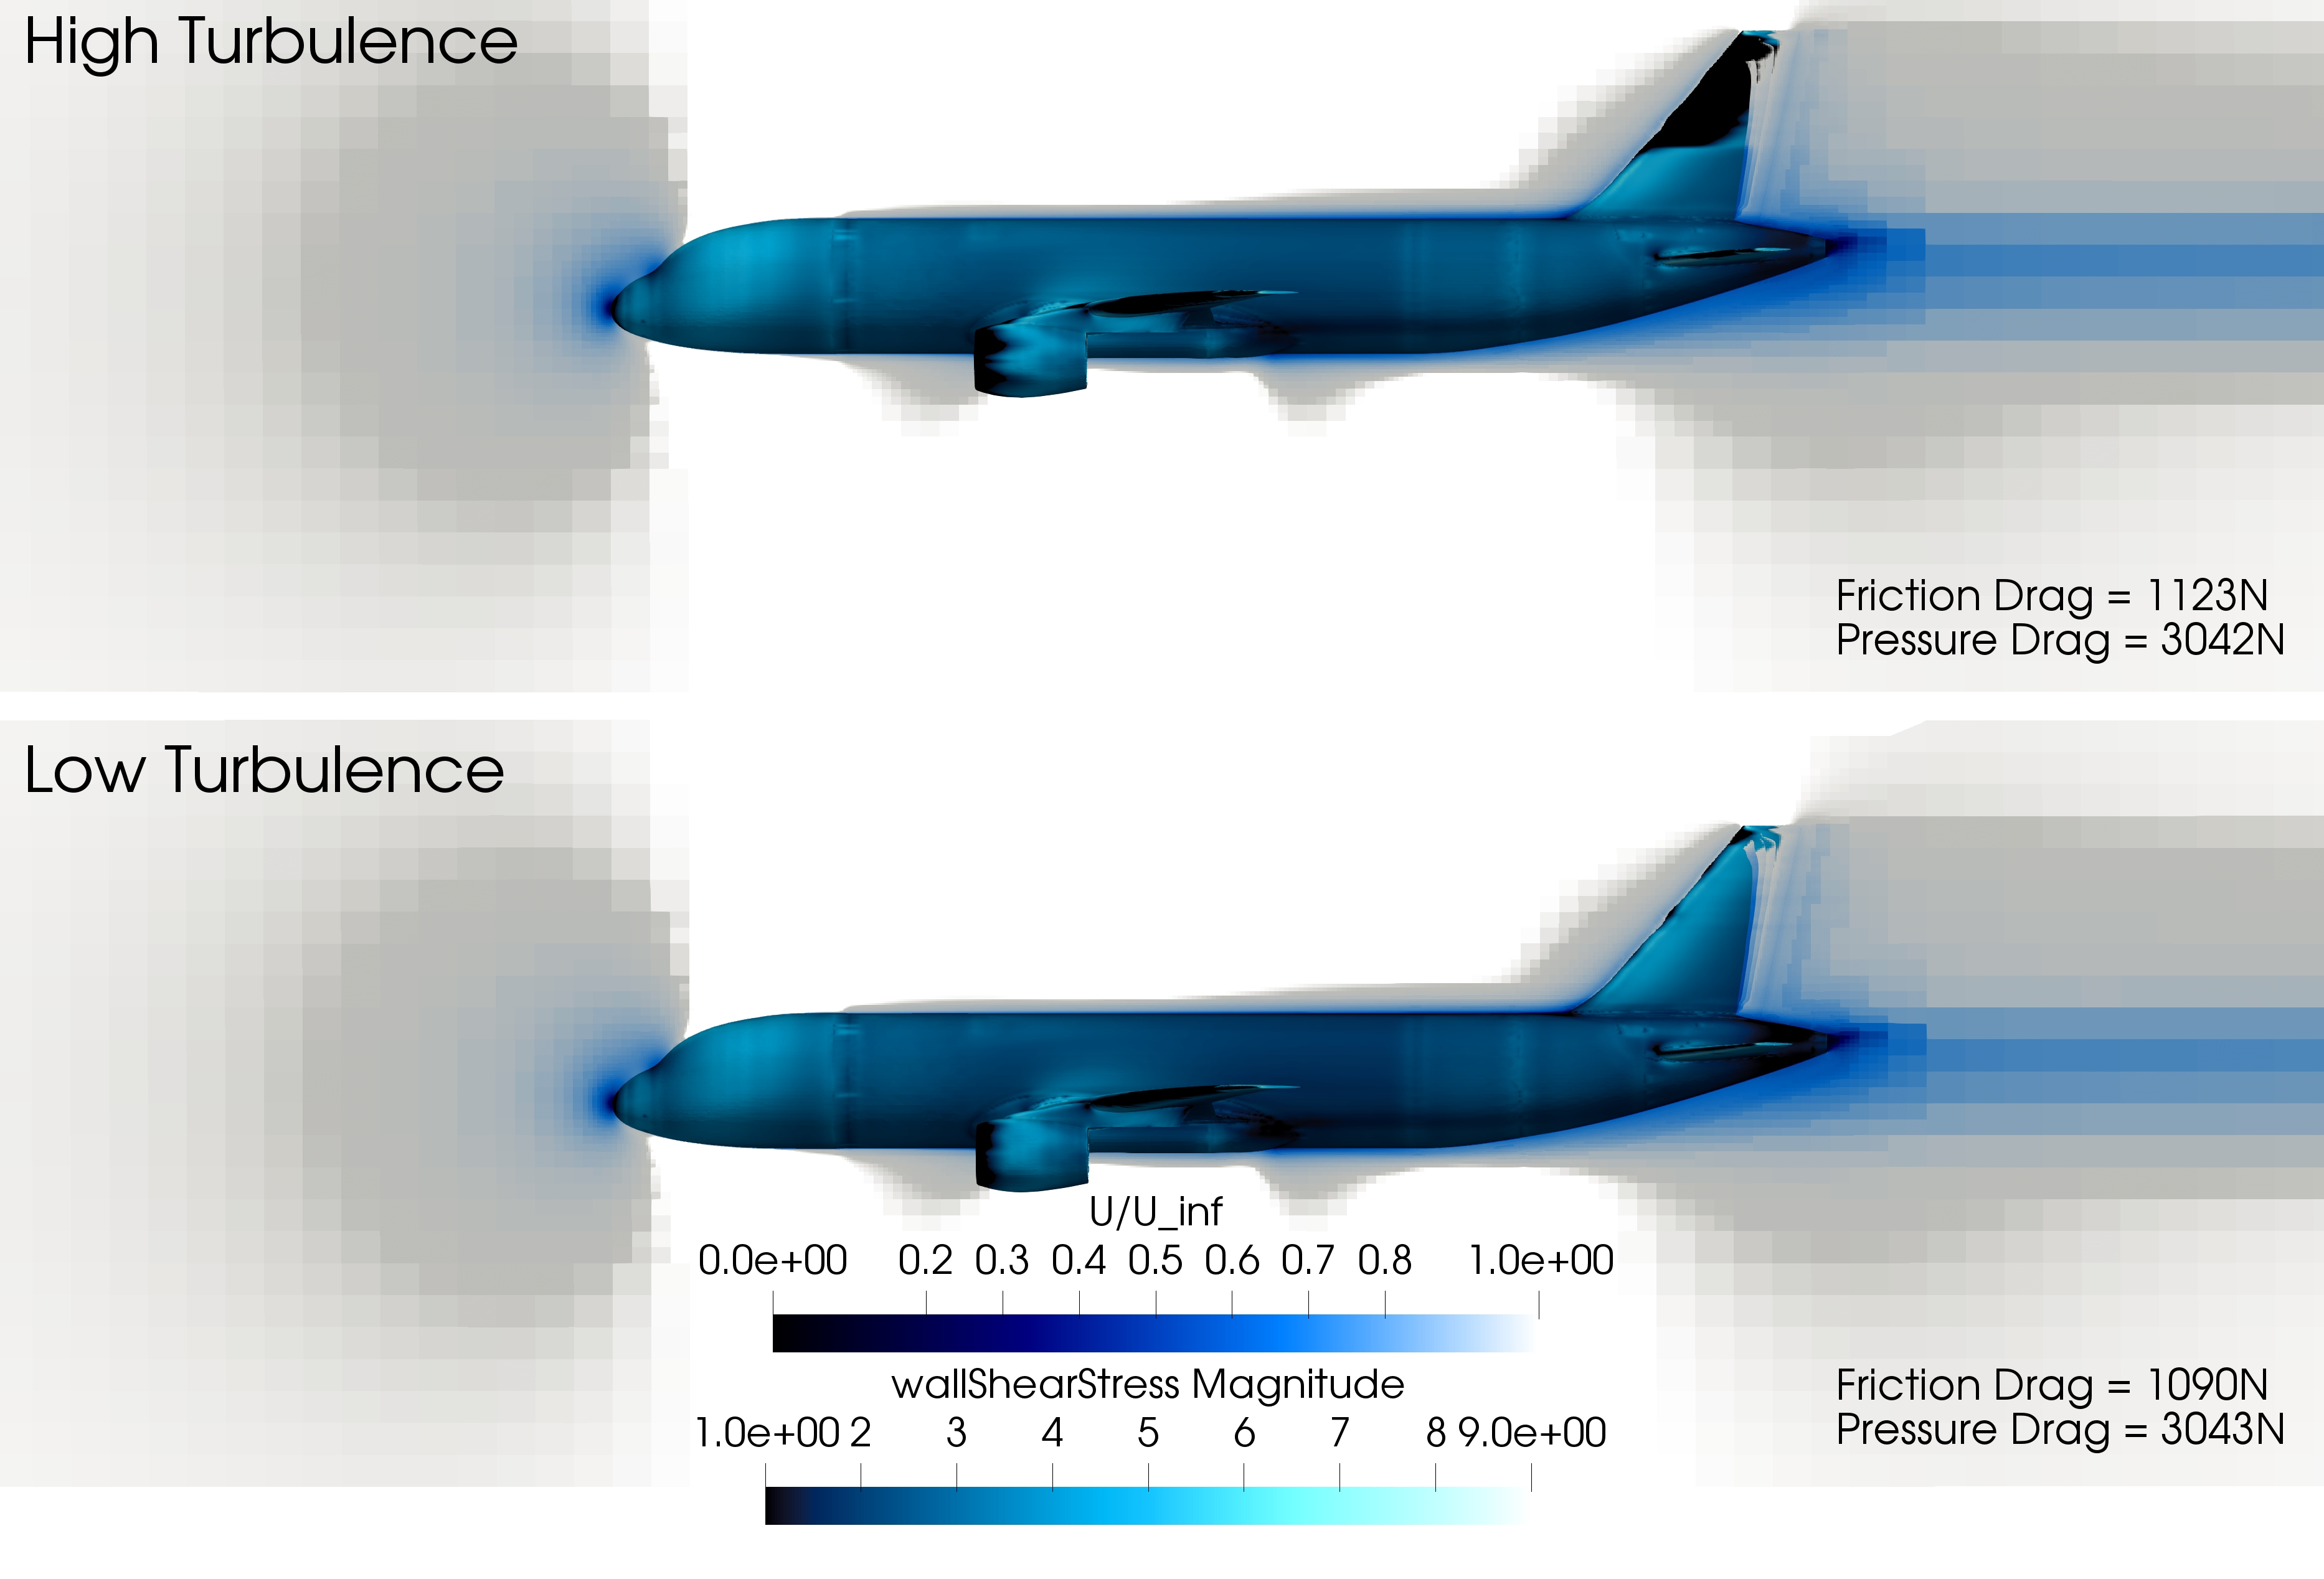 Plane5_Image